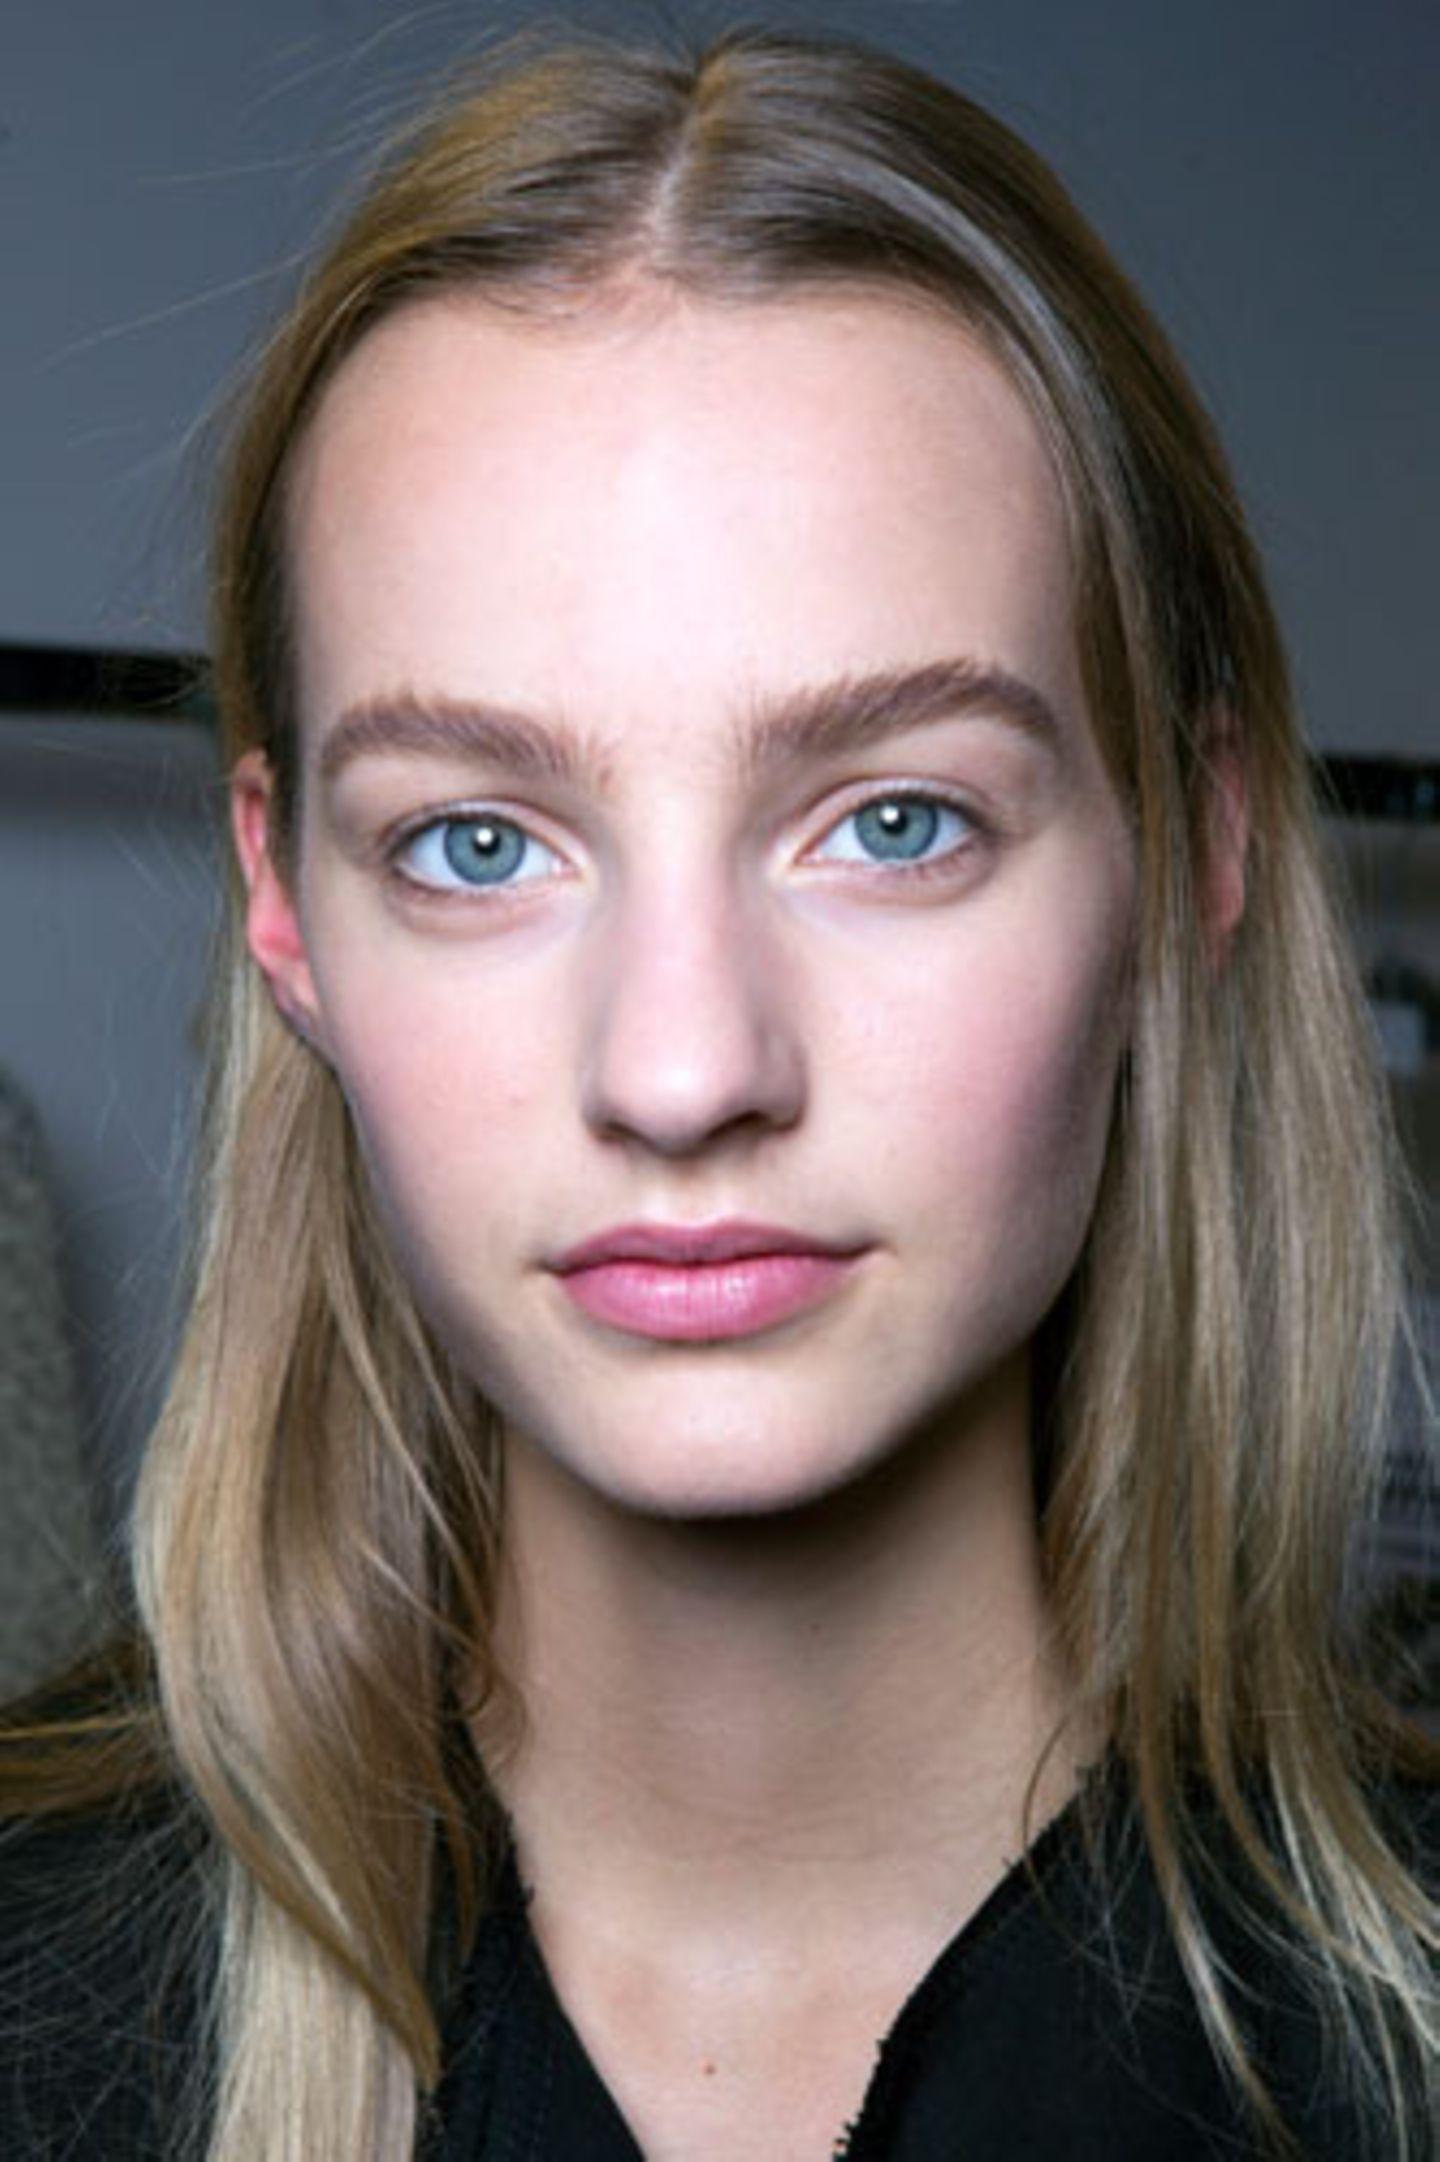 Wie wirkt Make-up: Zart betonte Lippen